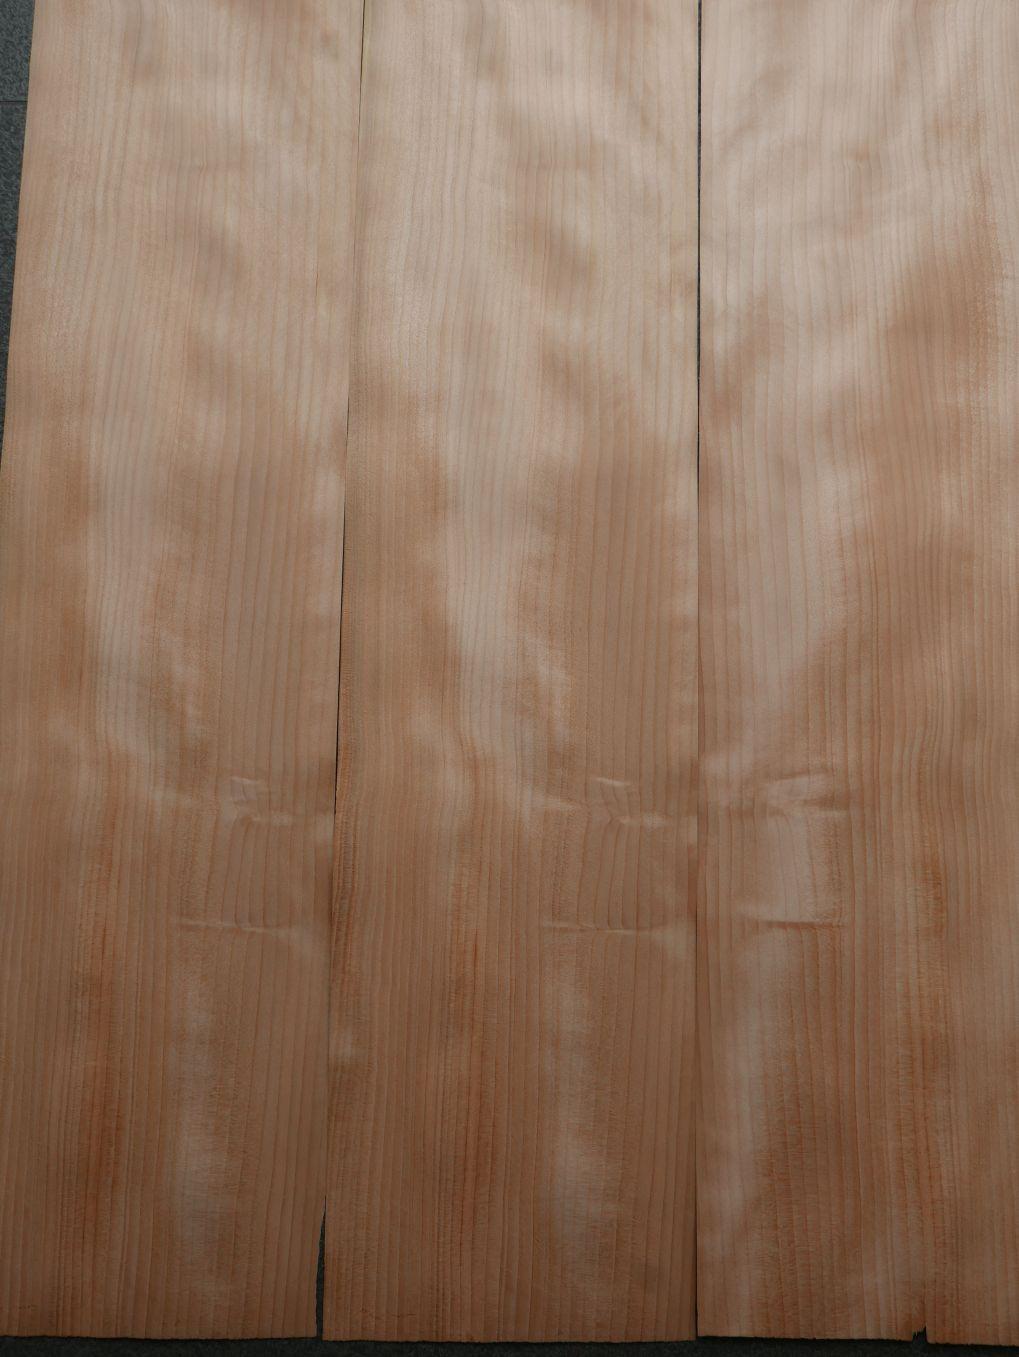 A0363-2 Libanon Ceder 30,5-31x120cm 24st